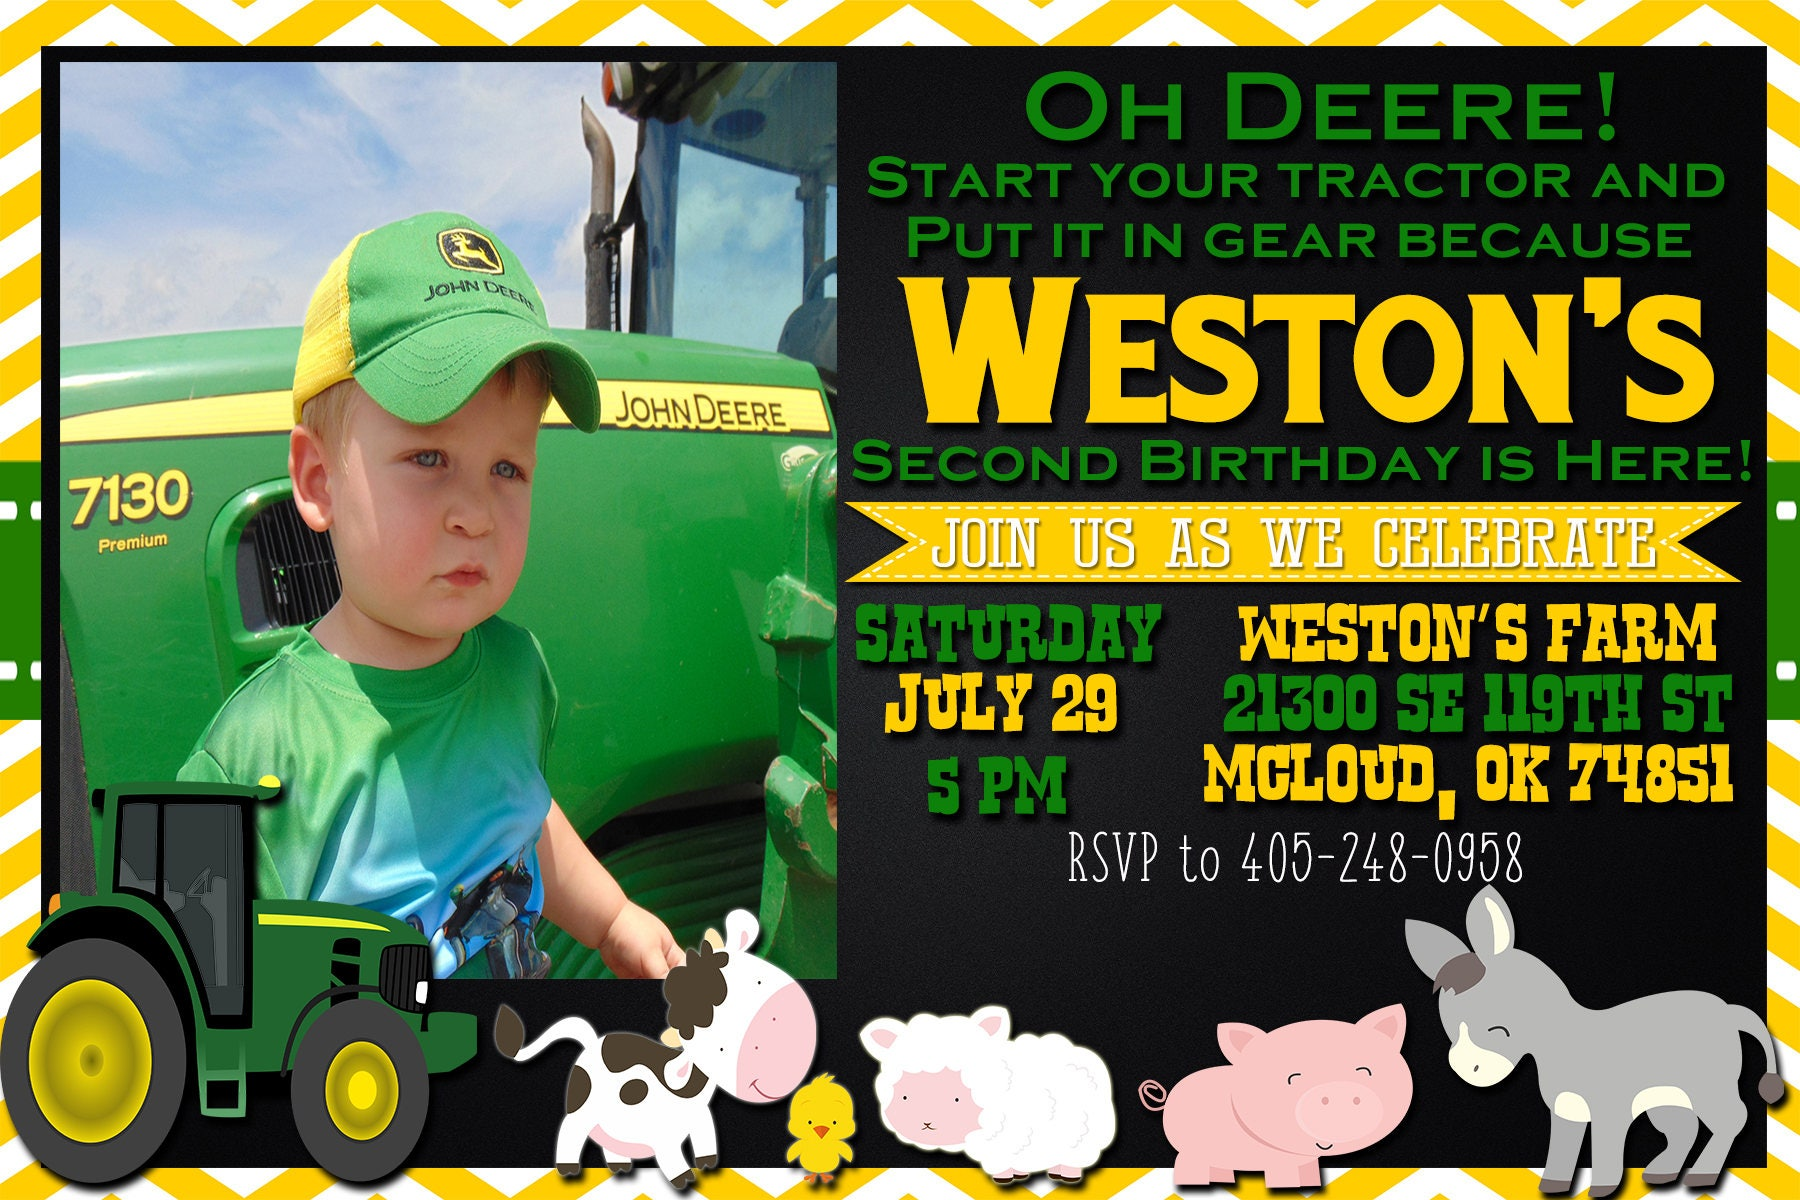 john deere//oh deere birthday invitation | etsy